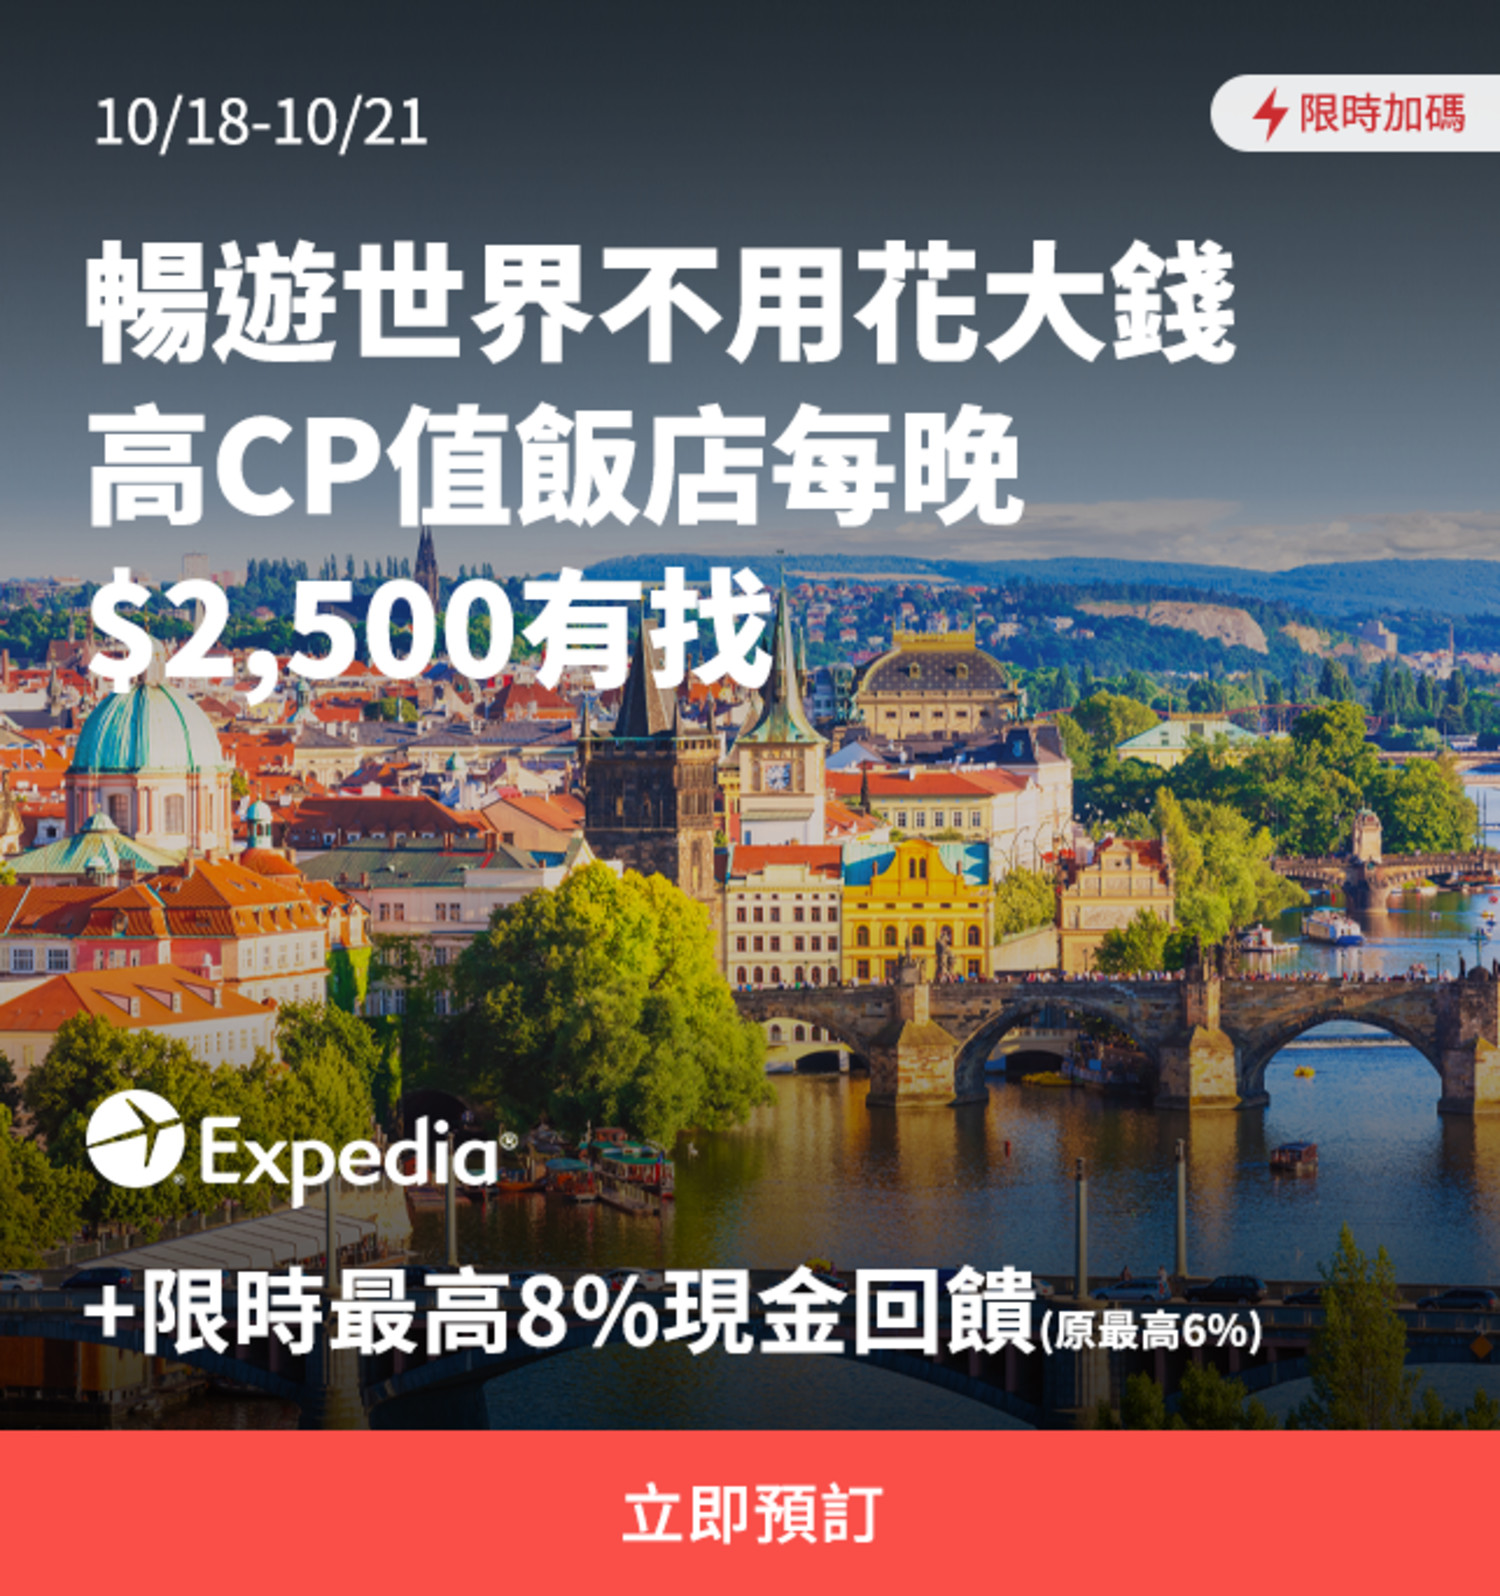 expedia 加碼最高8% 1018-1021